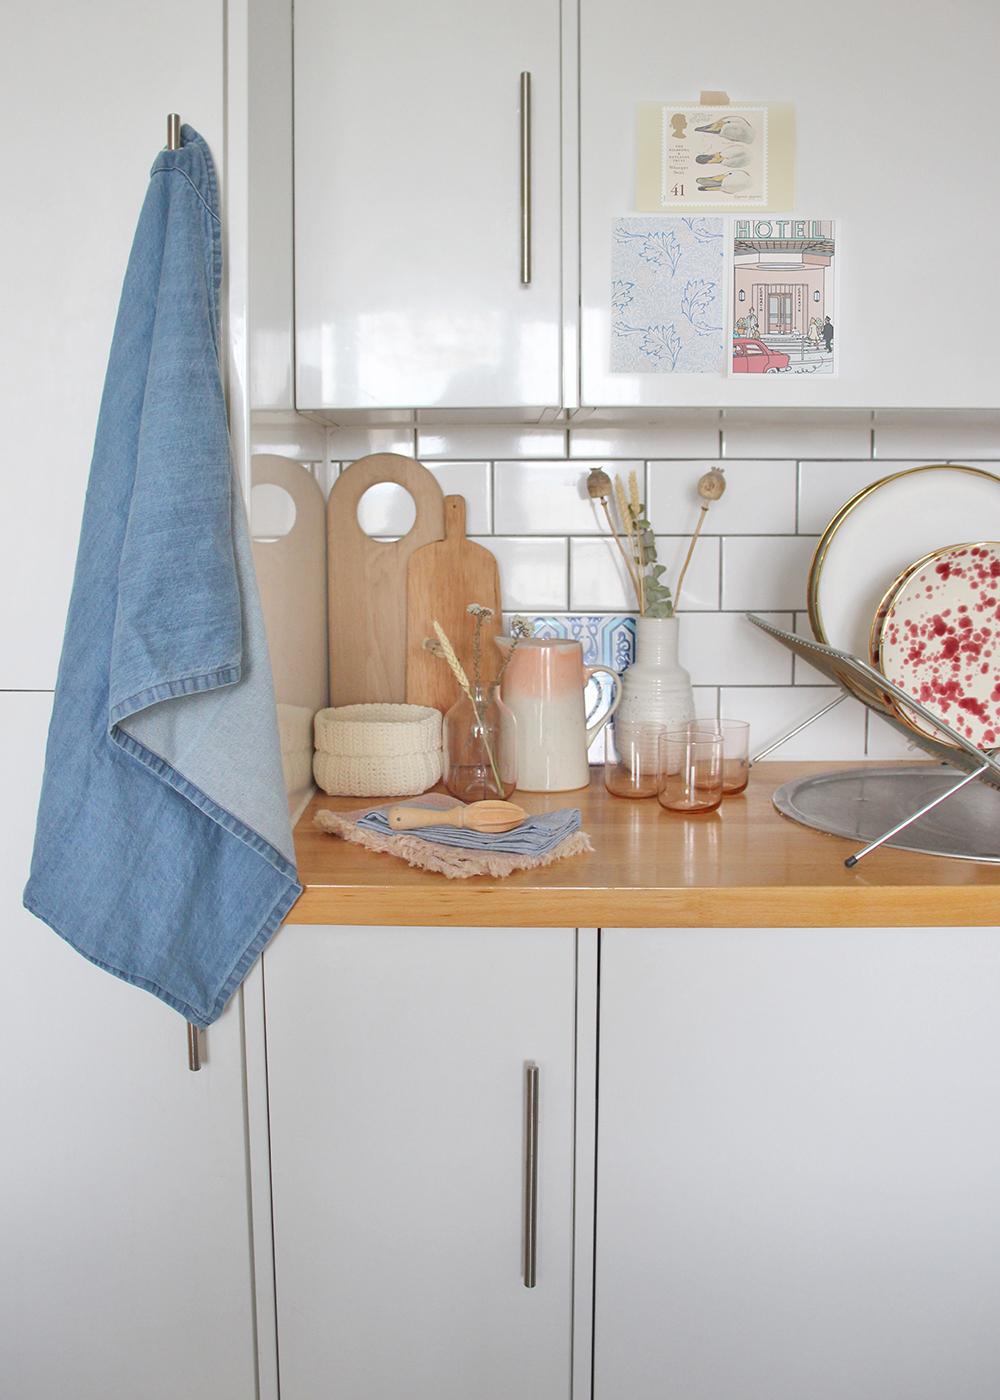 Nancy-straughan-new-build-modern-kitchen-interior-styling.jpg